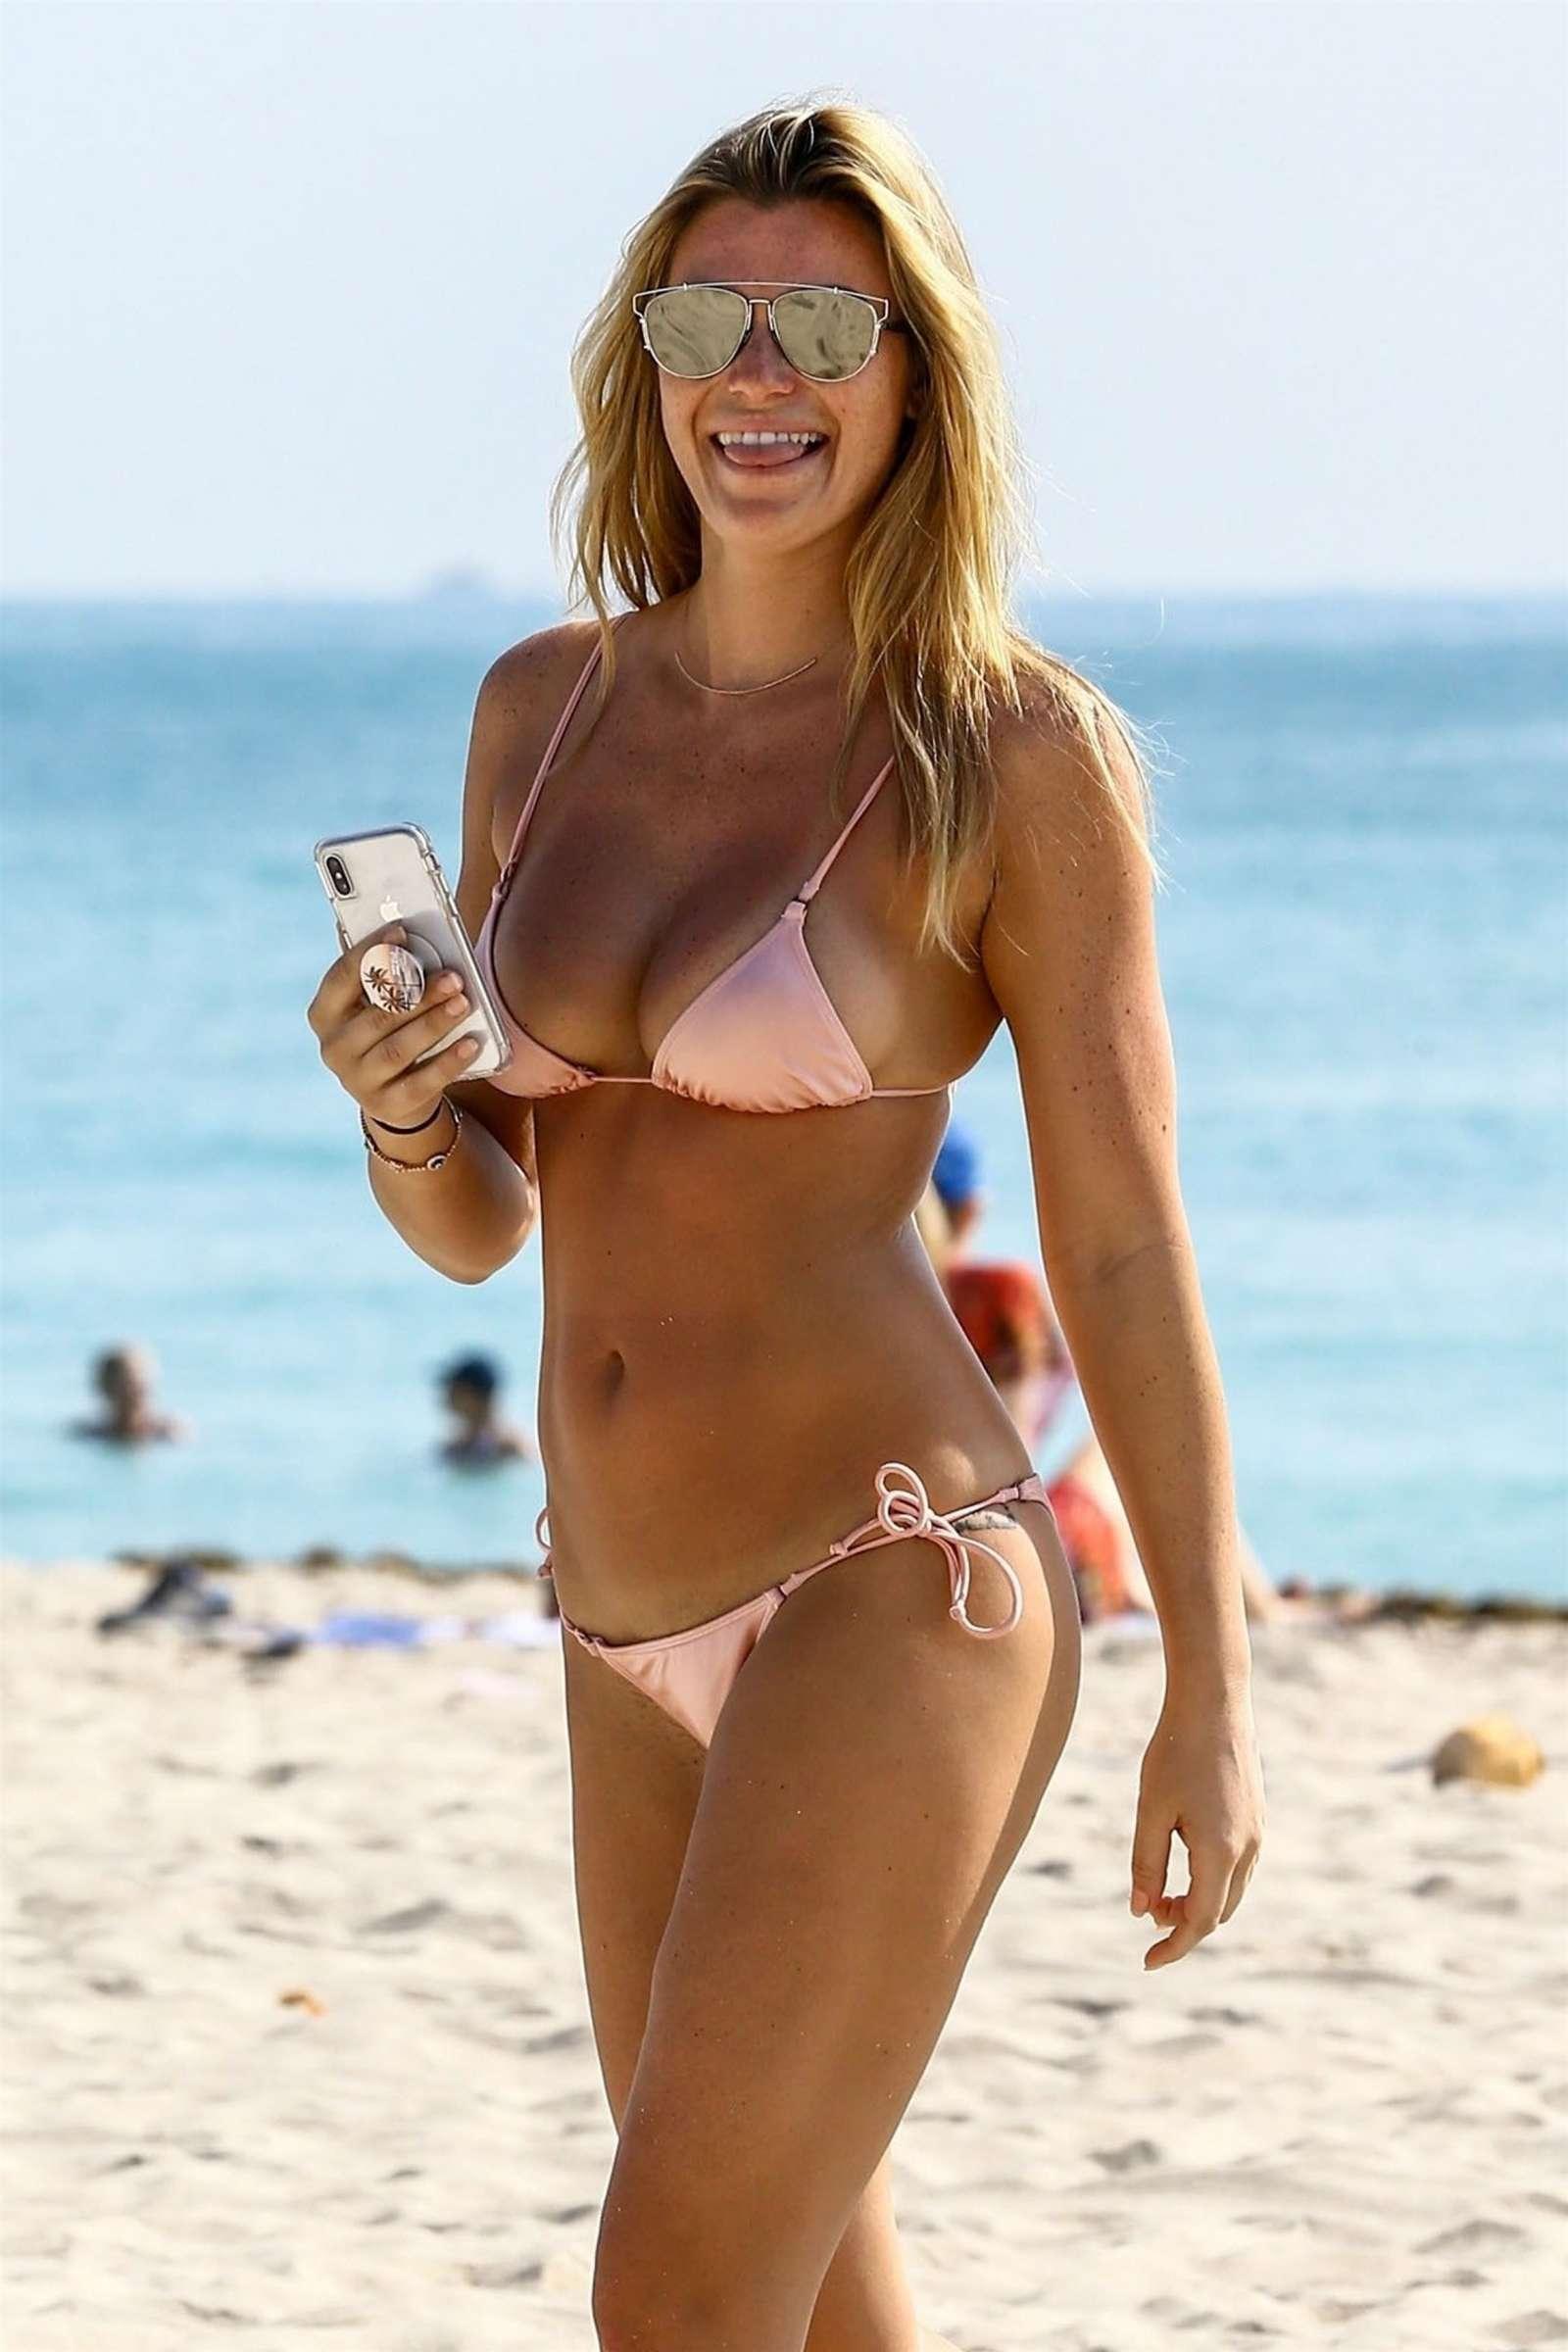 Samantha Hoopes in Pink Bikini on the beach in Miami